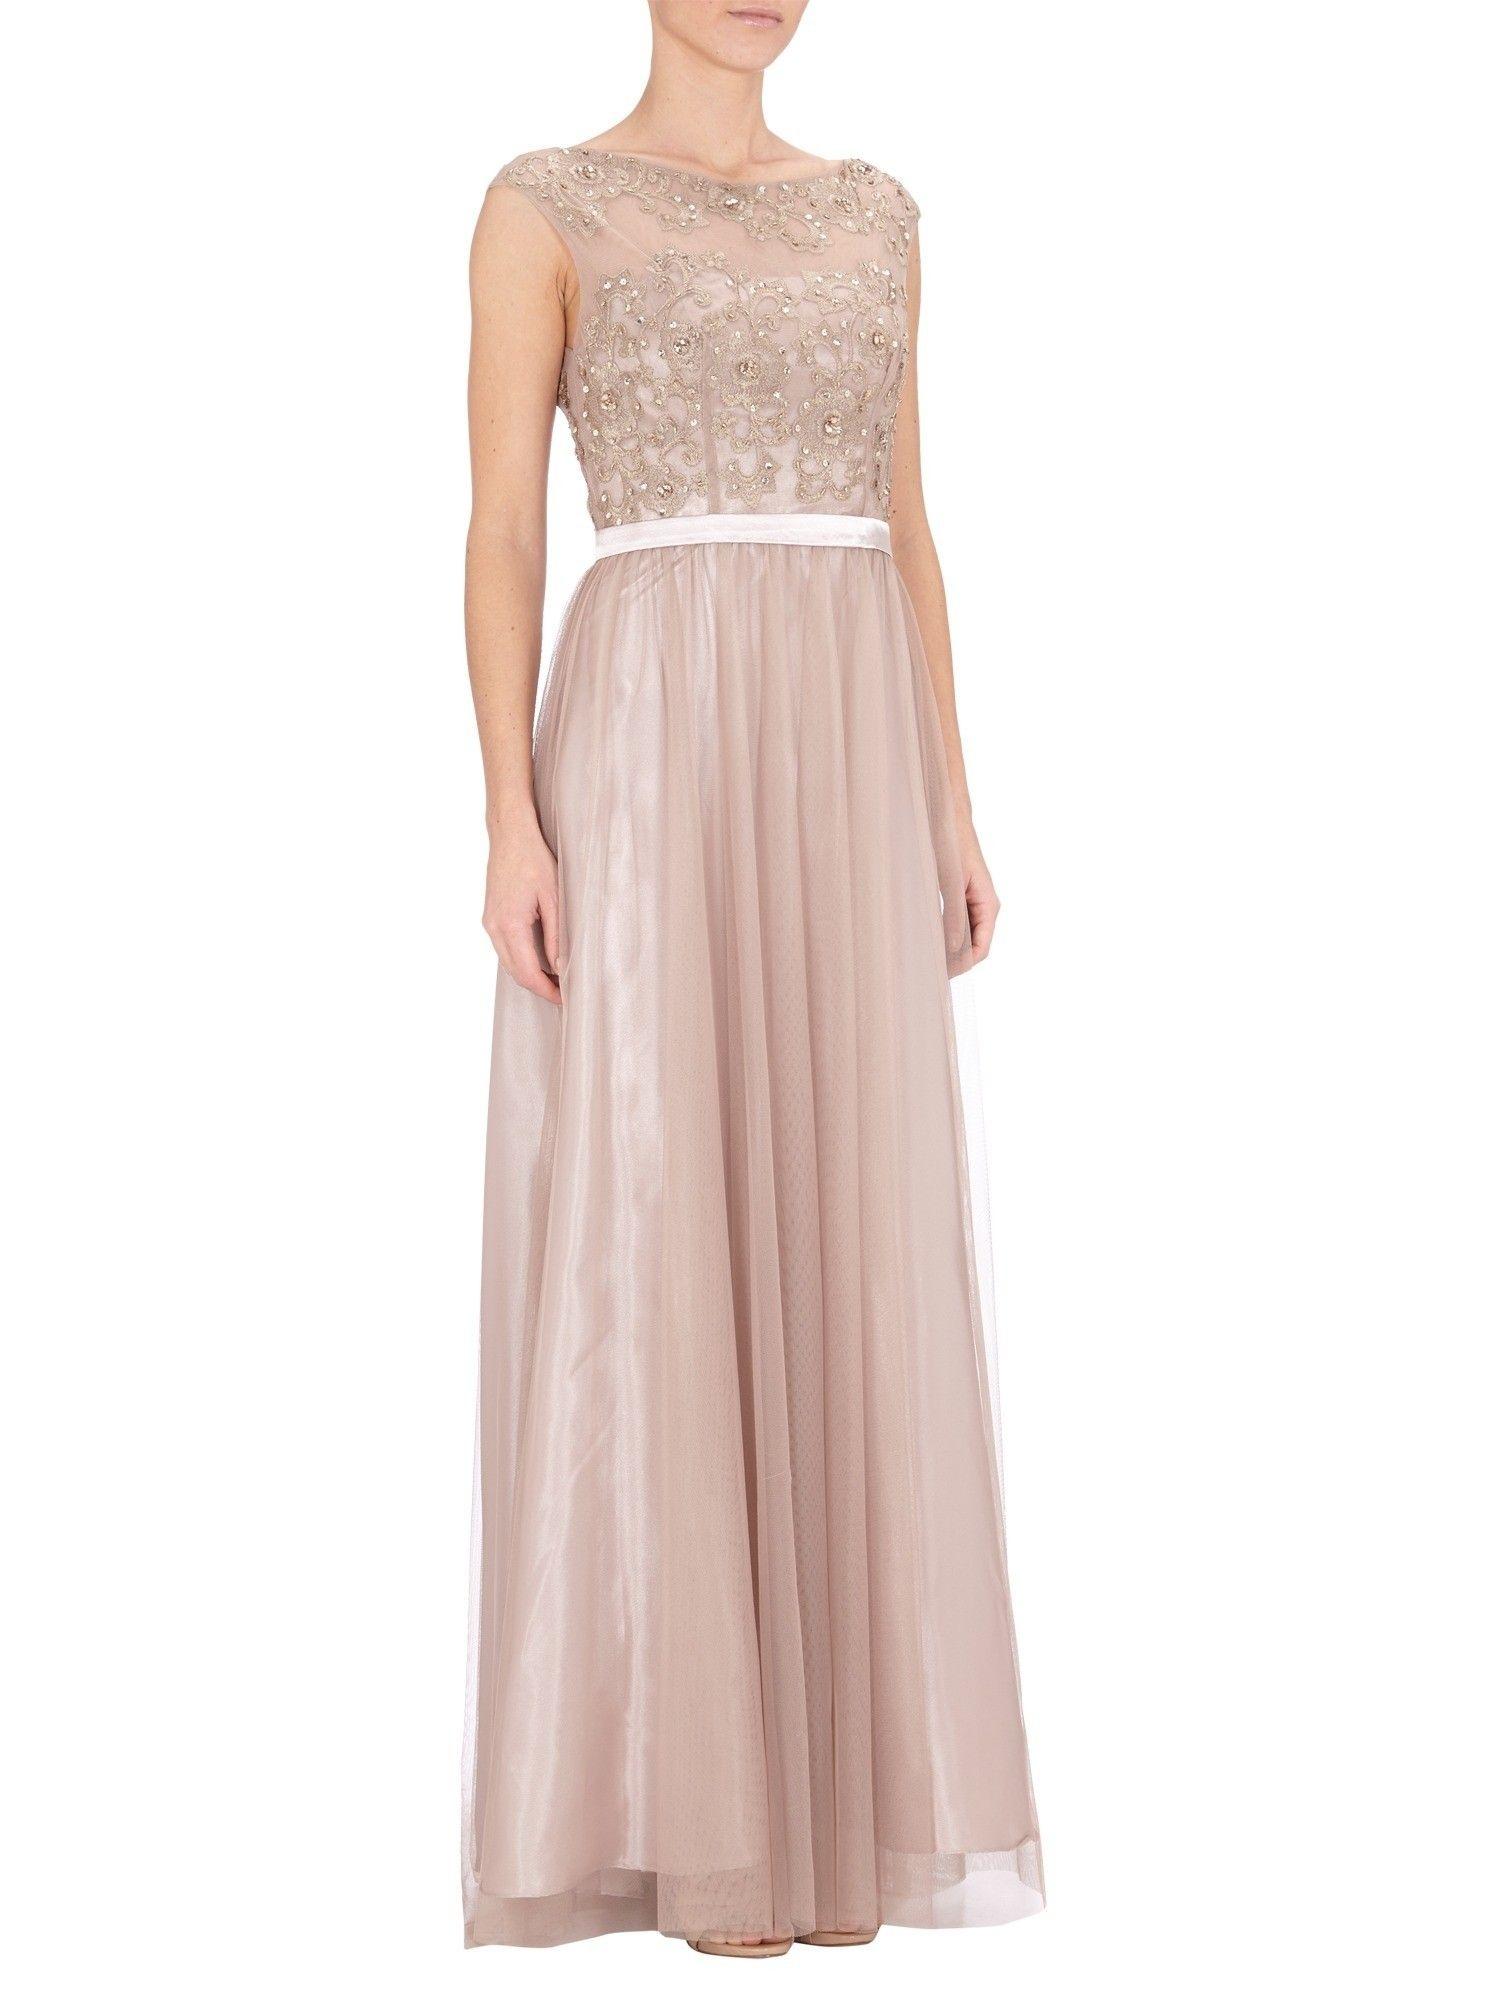 13 Elegant Abendkleid Taupe Boutique15 Top Abendkleid Taupe Vertrieb